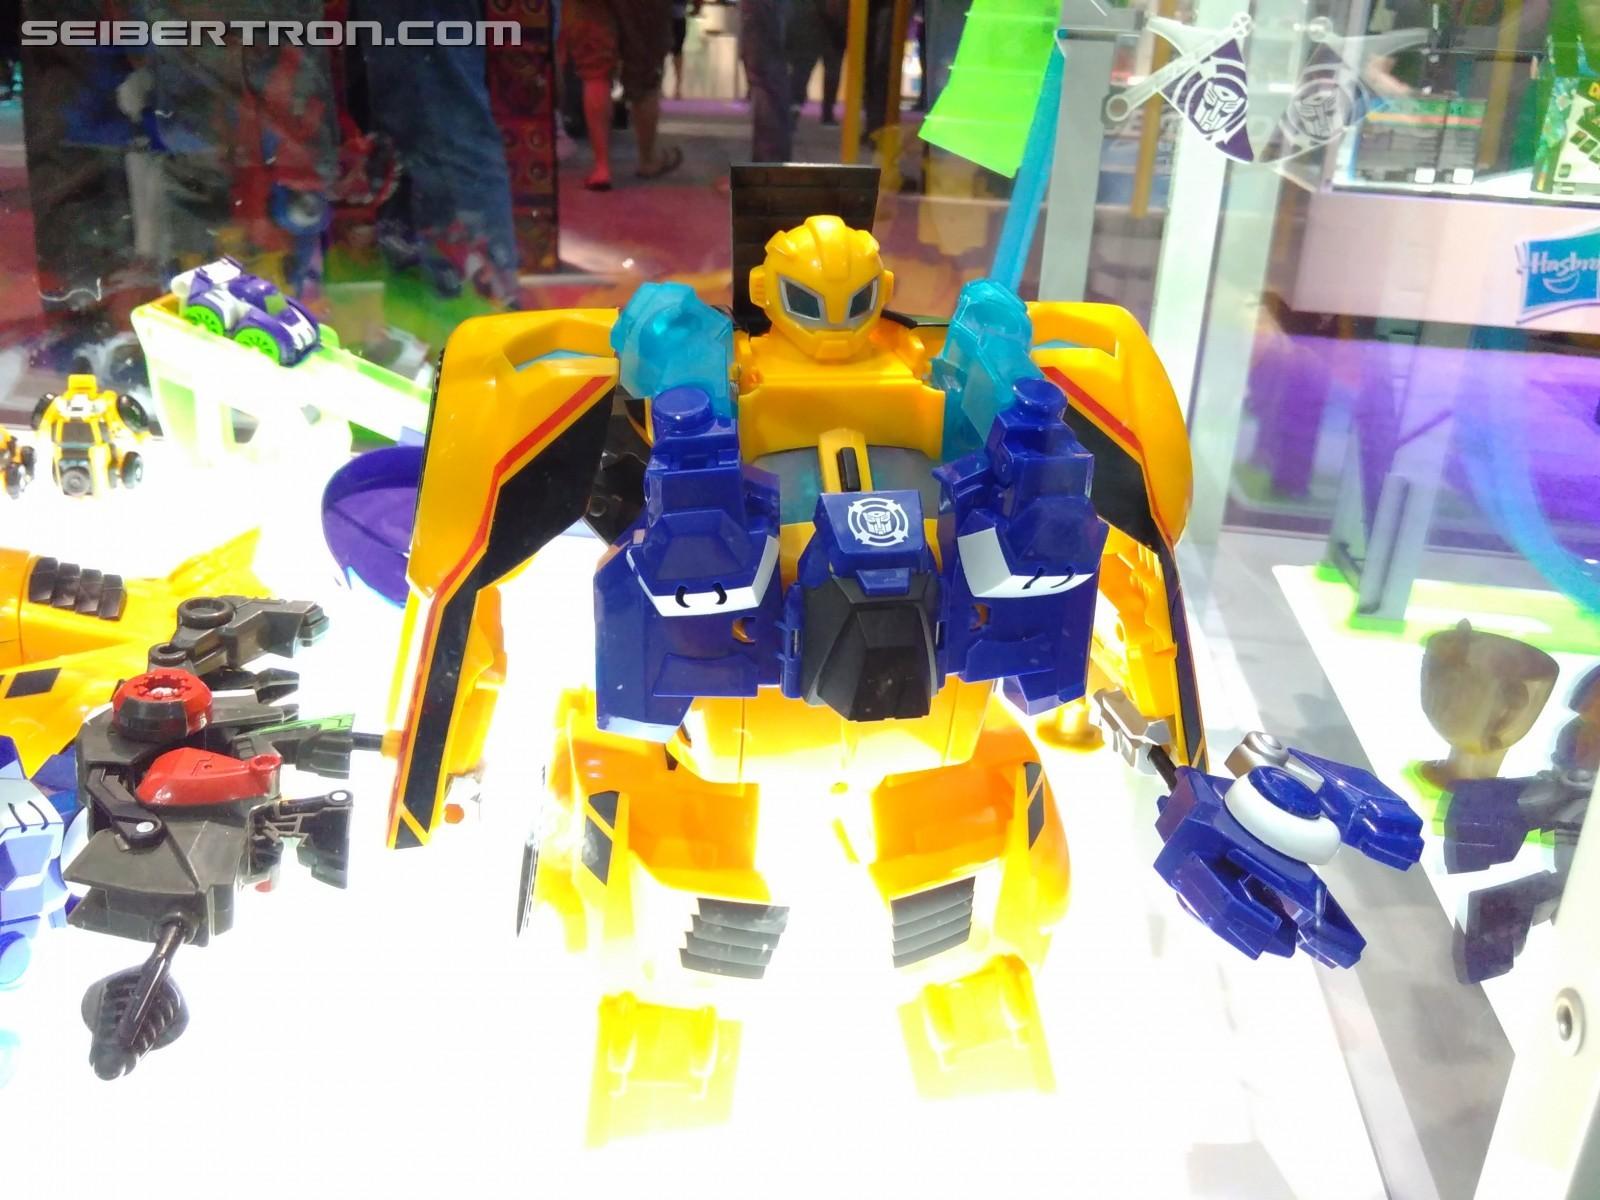 New Transformers Rescue Bots Toys Revealed Hasbrosdcc